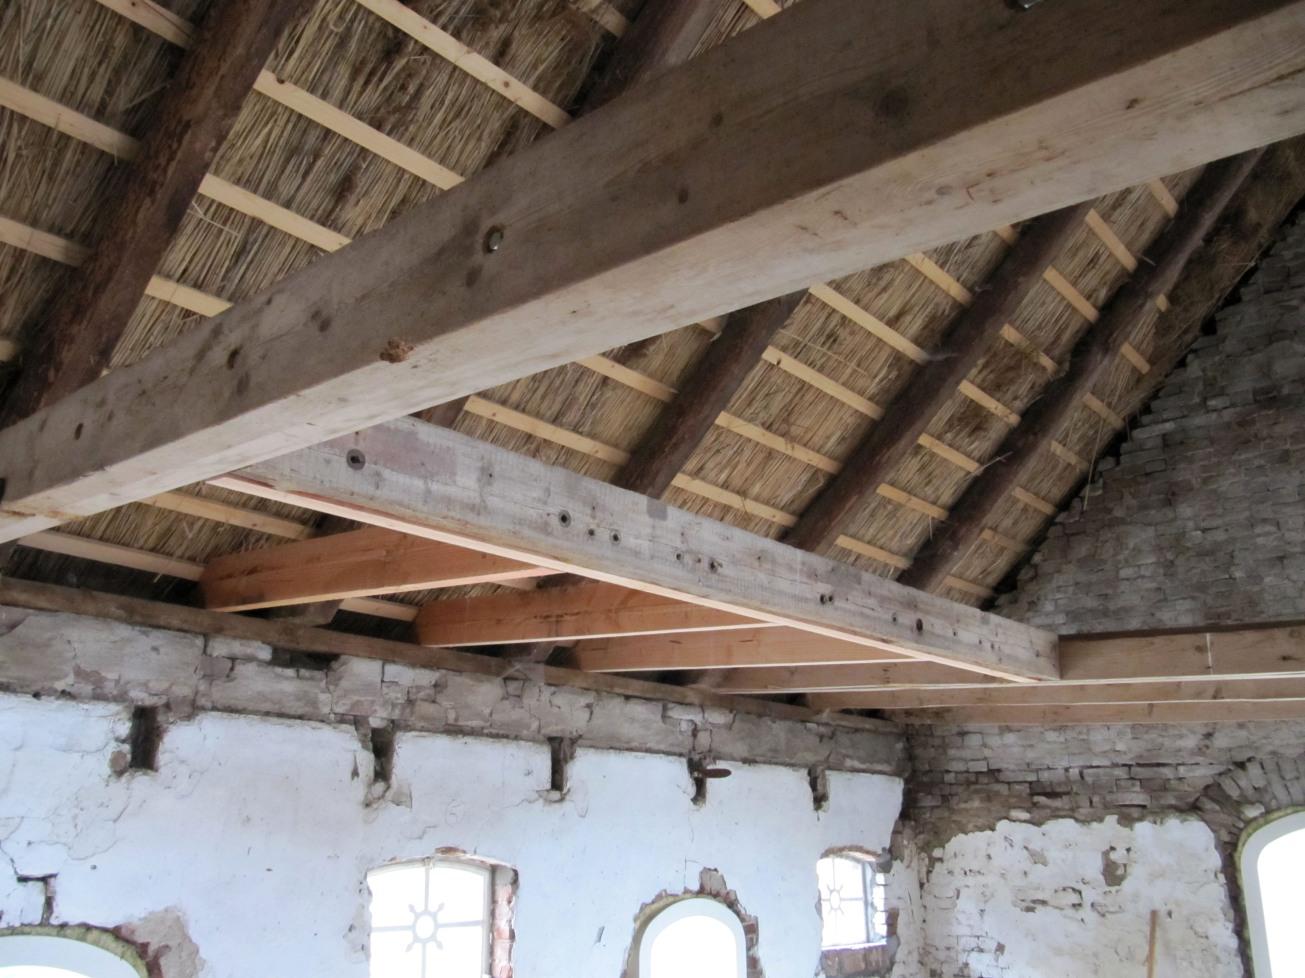 Midweek in okkenbroek 26 t m 29 december huis in huis in okkenbroek - Opruimen houten balk ...